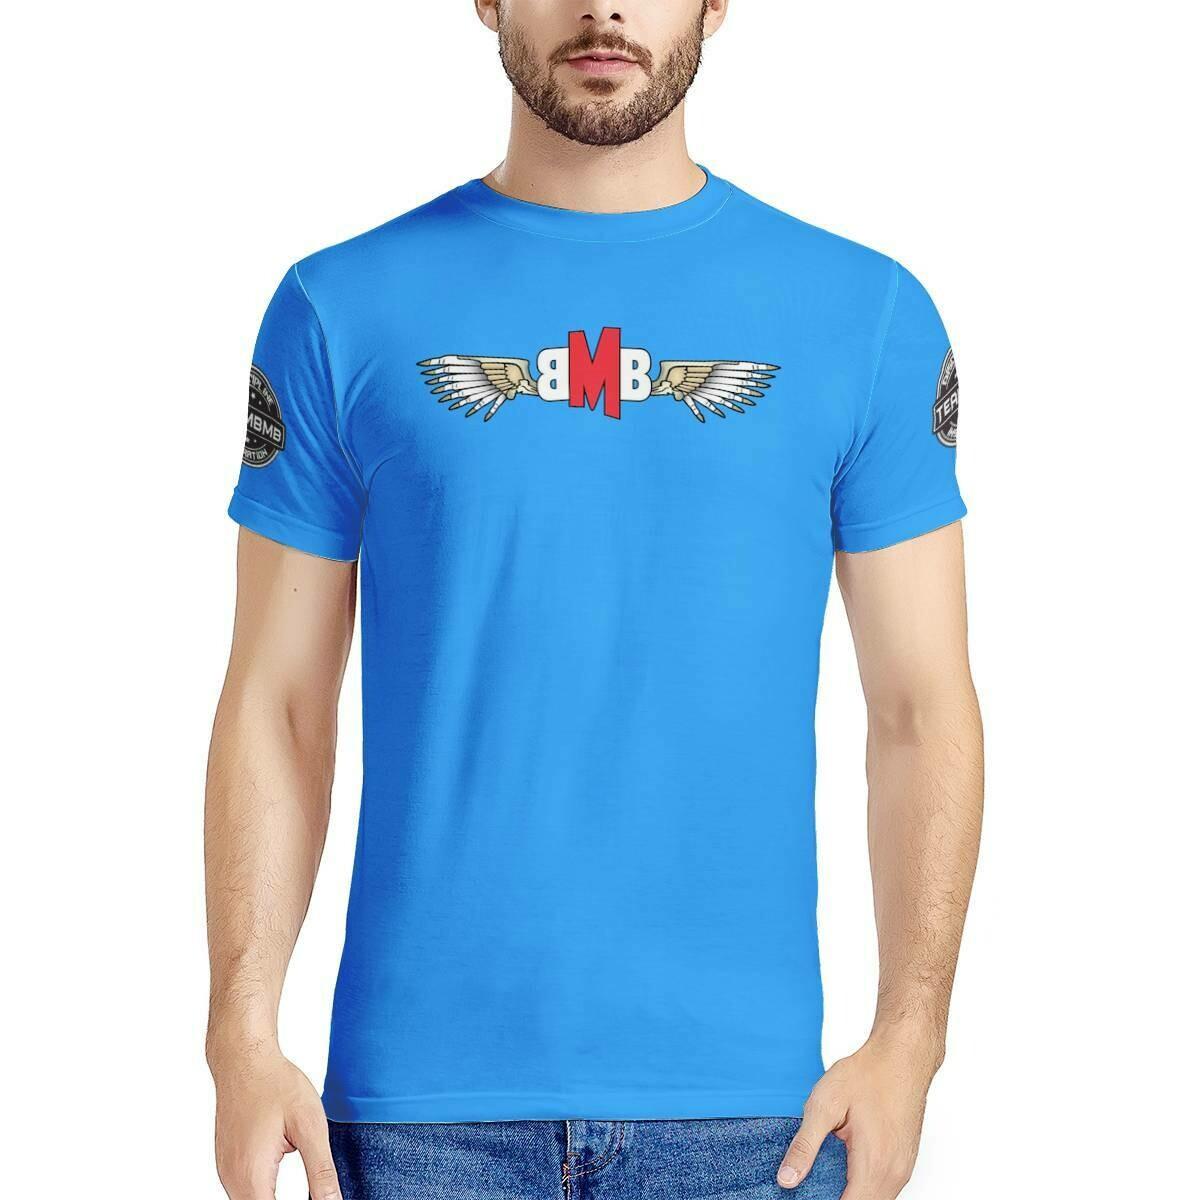 New  BMB Unisex T-shirt